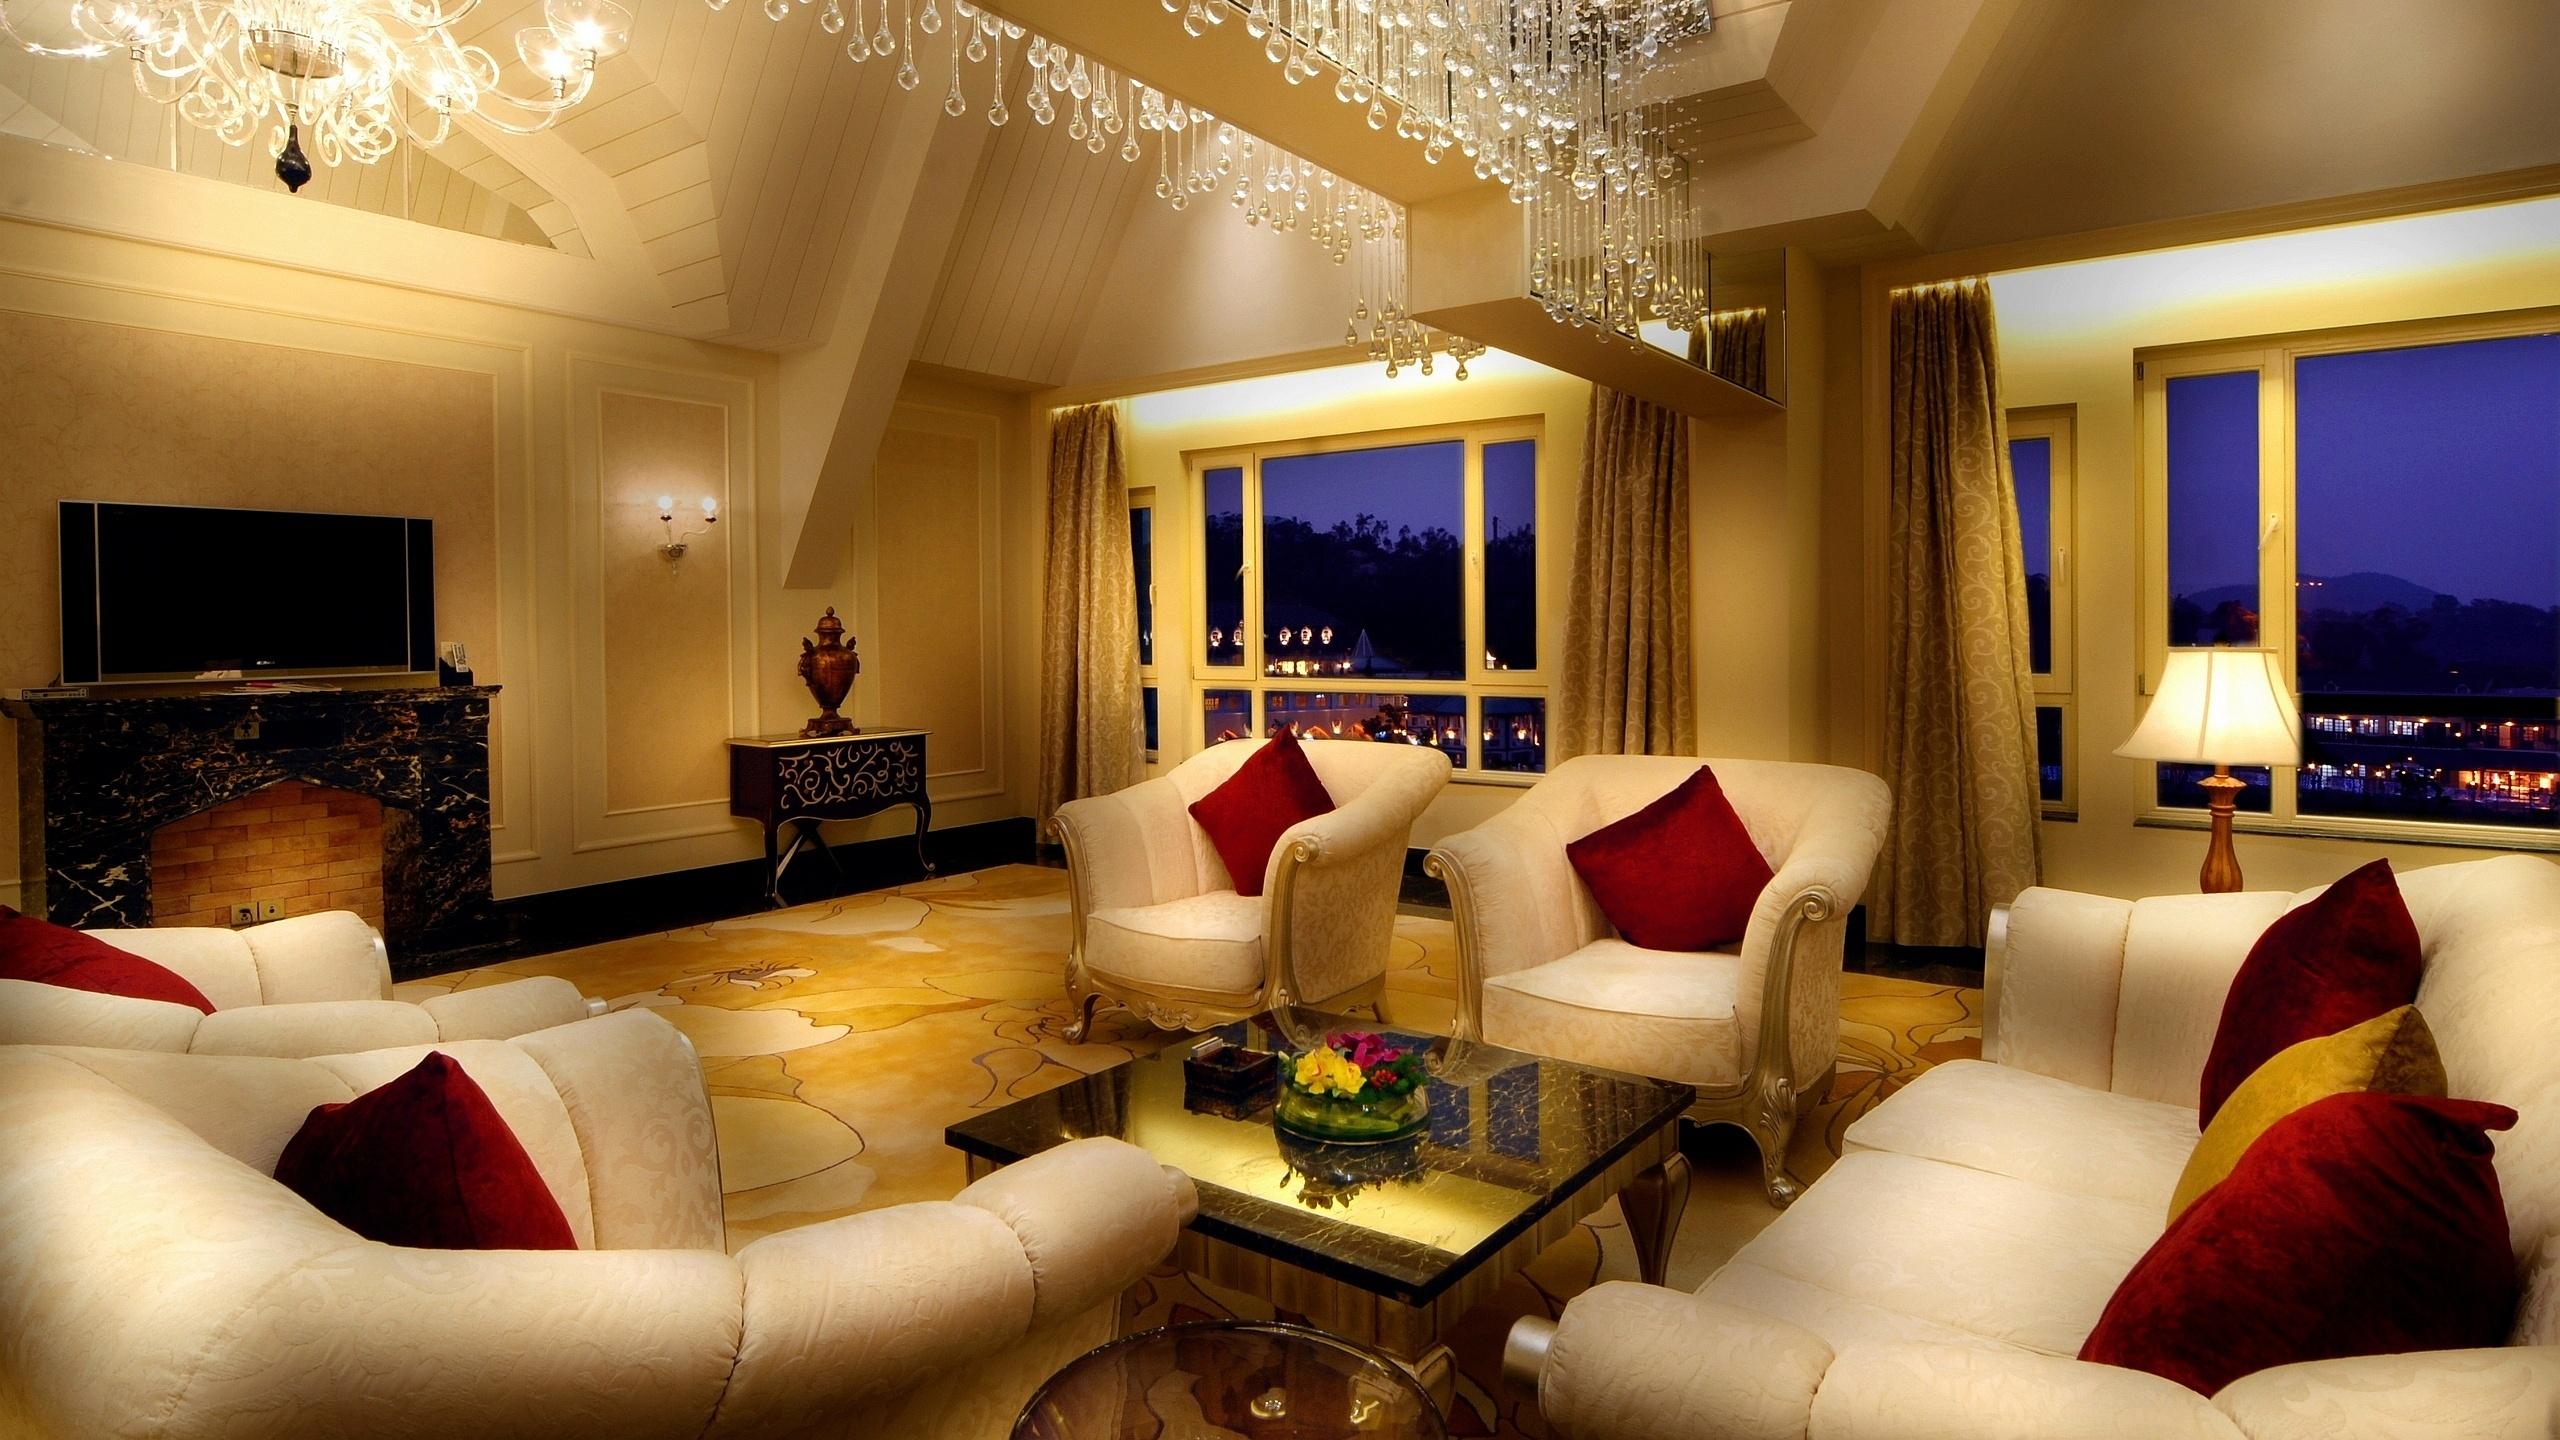 Luxury Room Wallpaper Hd 2560x1440 Download Hd Wallpaper Wallpapertip